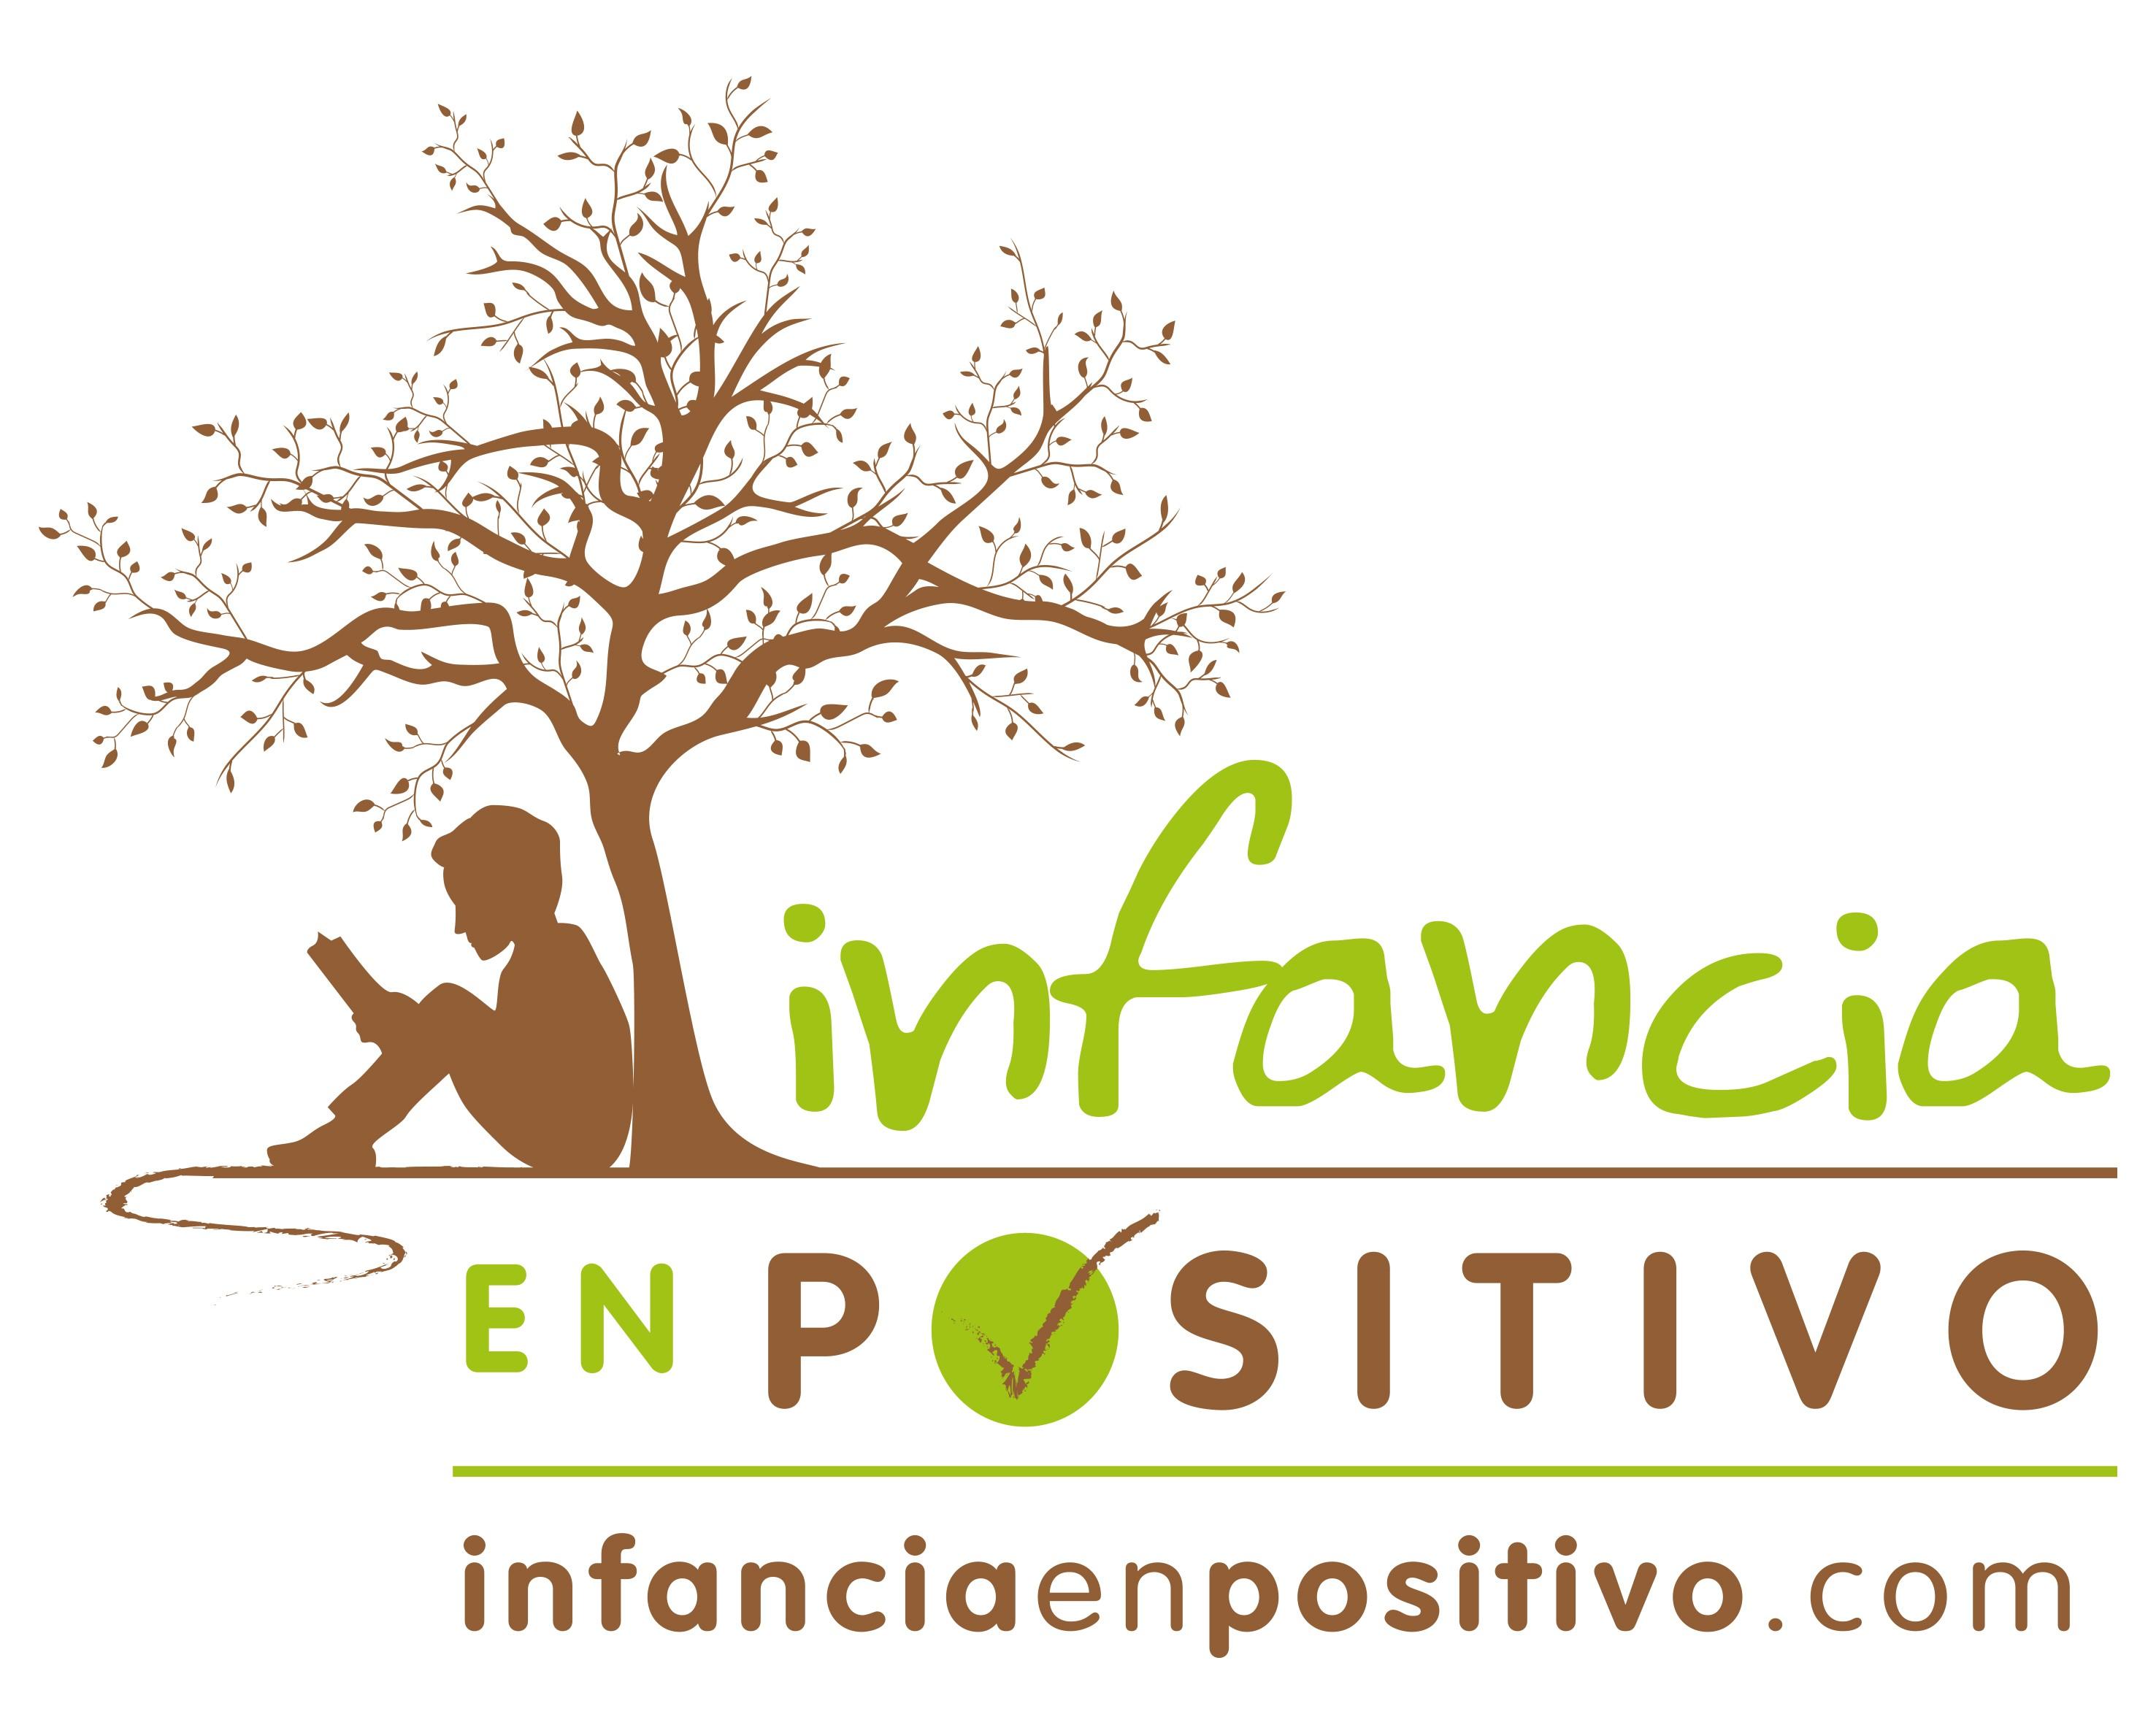 INFANCIA EN POSITIVO.COM